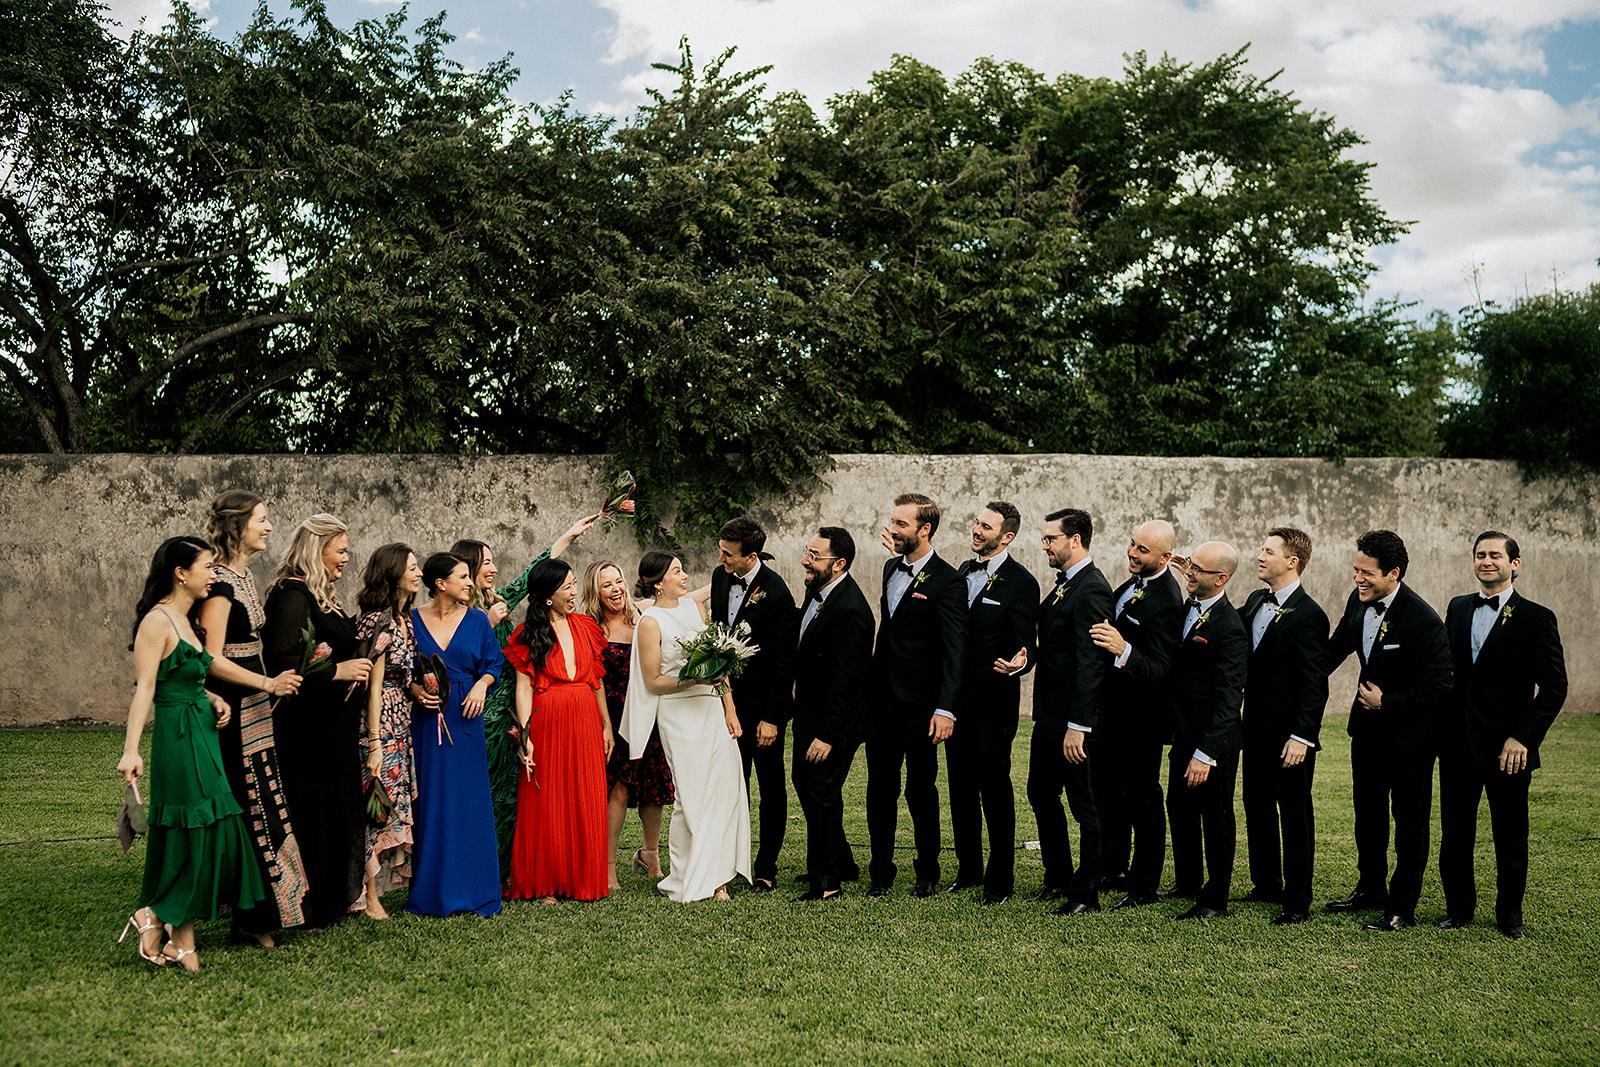 AmandaMarkus-Hacienda-Sac-Chich-Merida-Wedding-206_websize.jpg